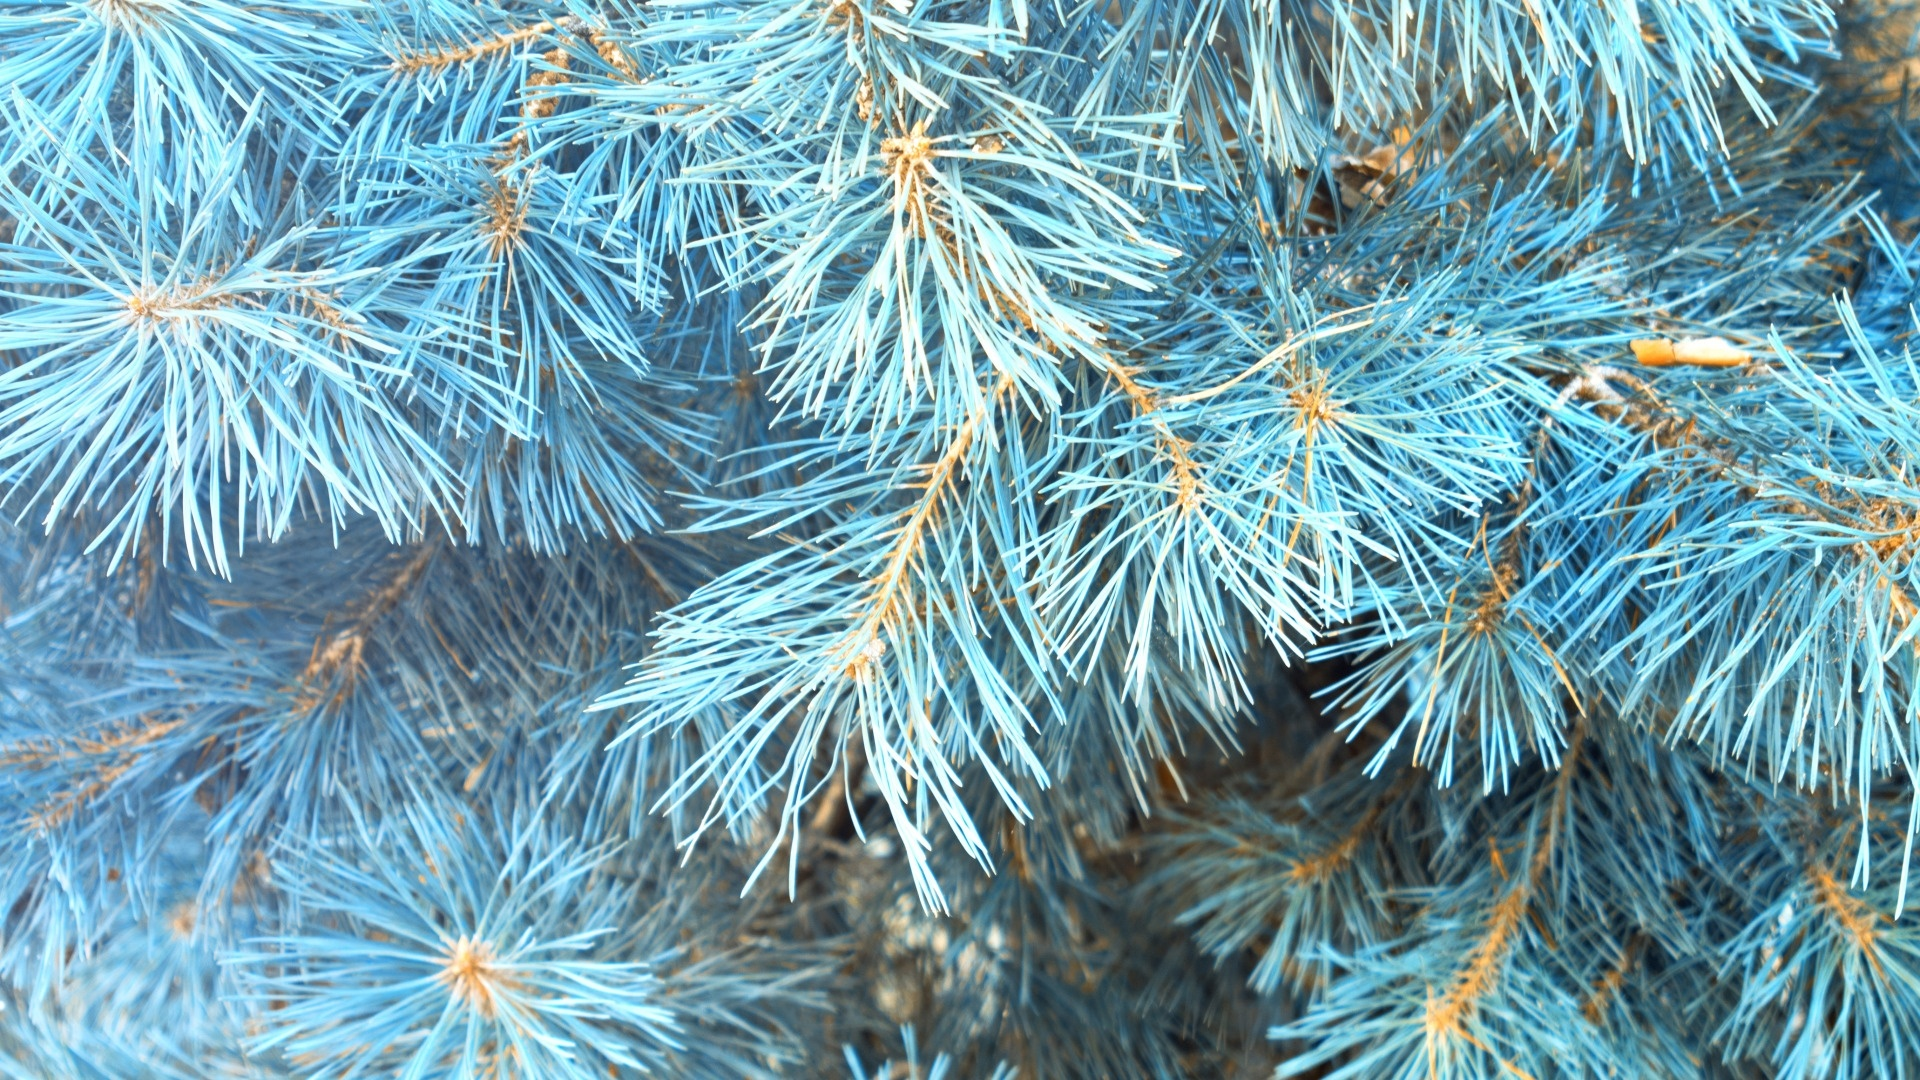 Spruce Branches desktop wallpaper hd